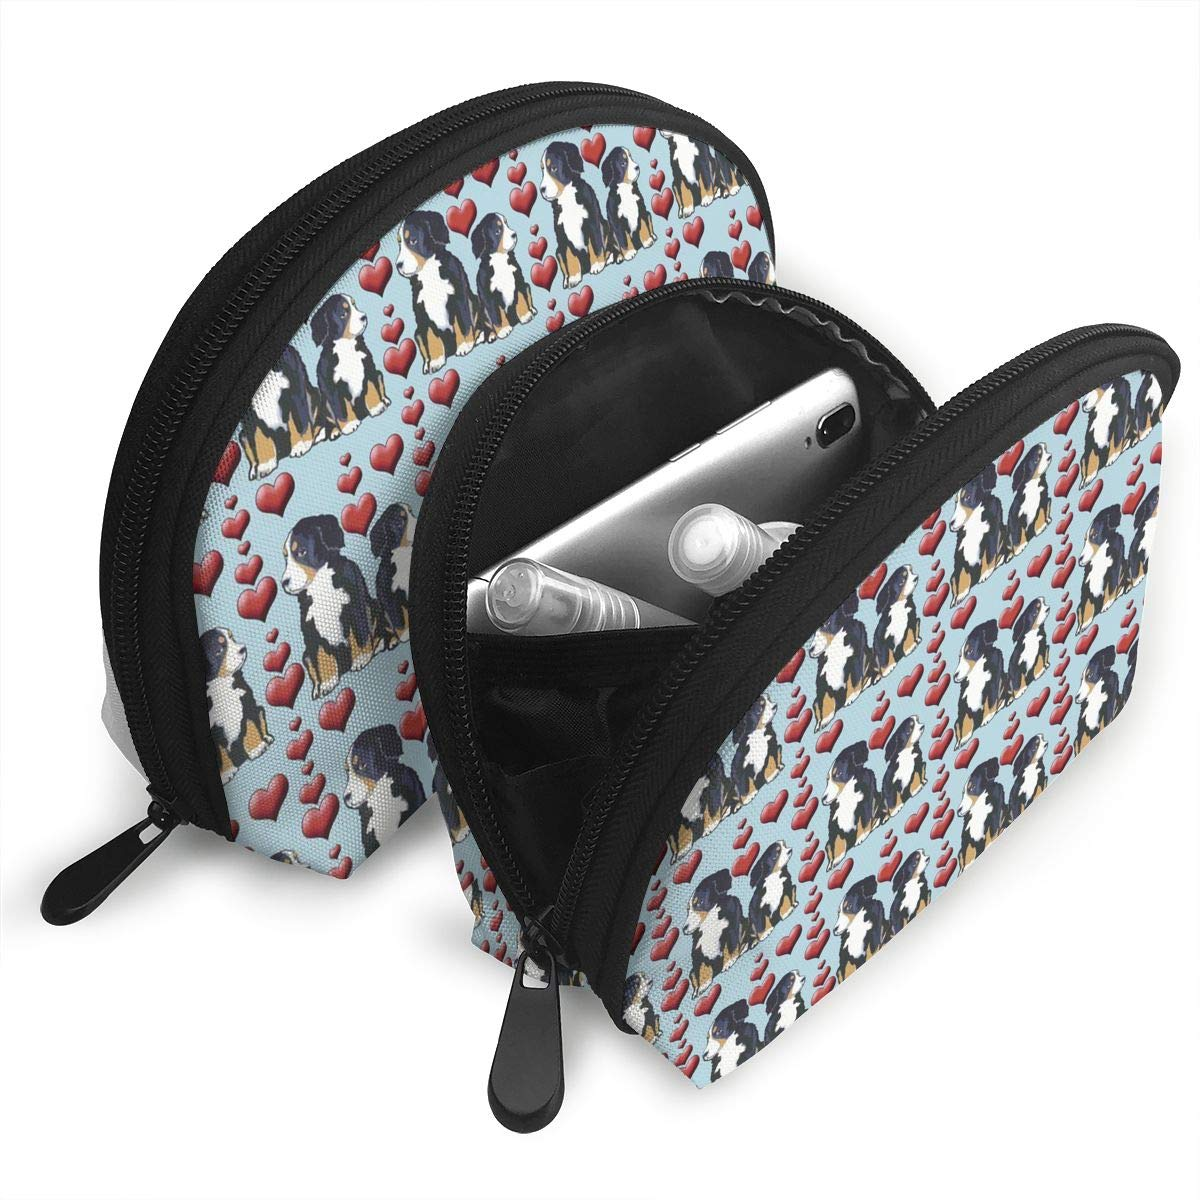 a69dd7d73b2f Amazon.com: XINLLPO Bernese Mountain Dog Puppies Hearts Portable ...